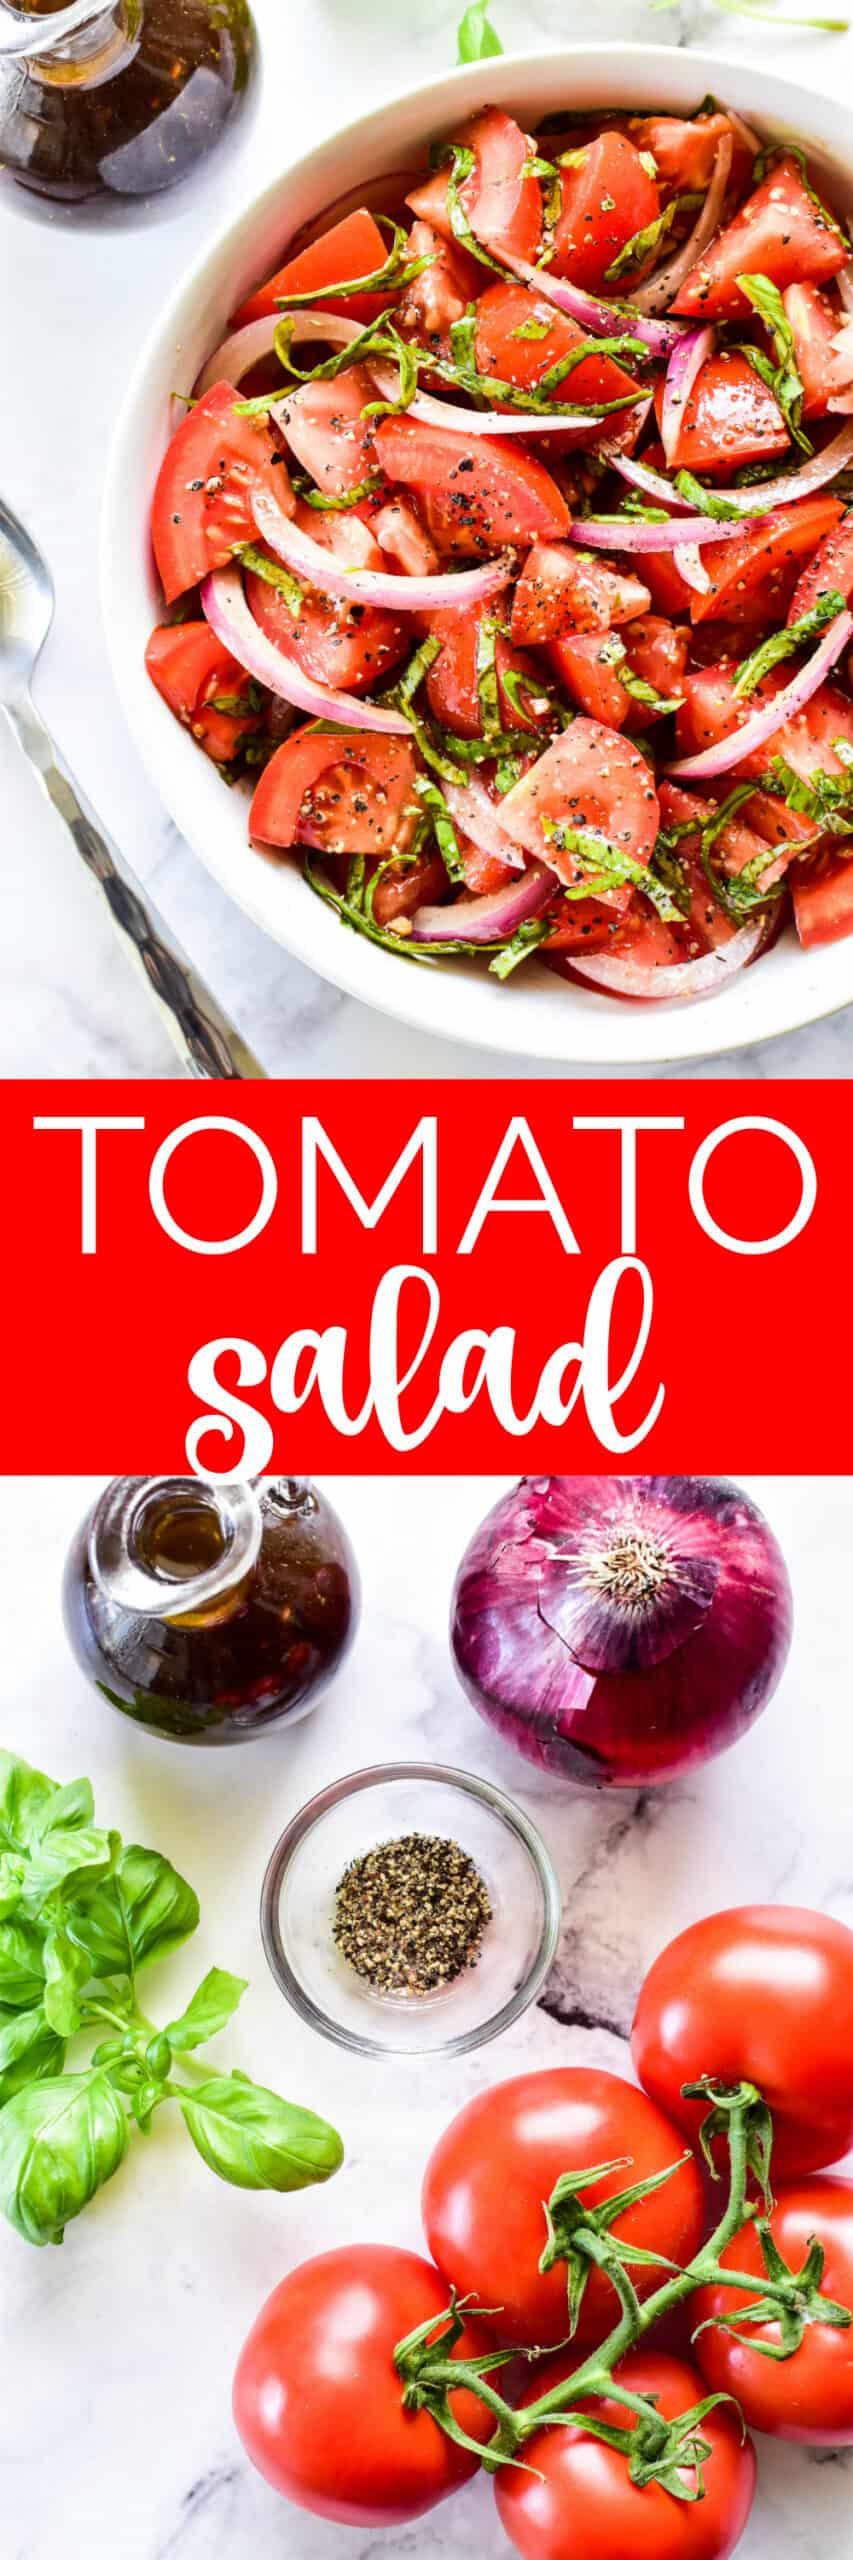 Collage image of Tomato Salad